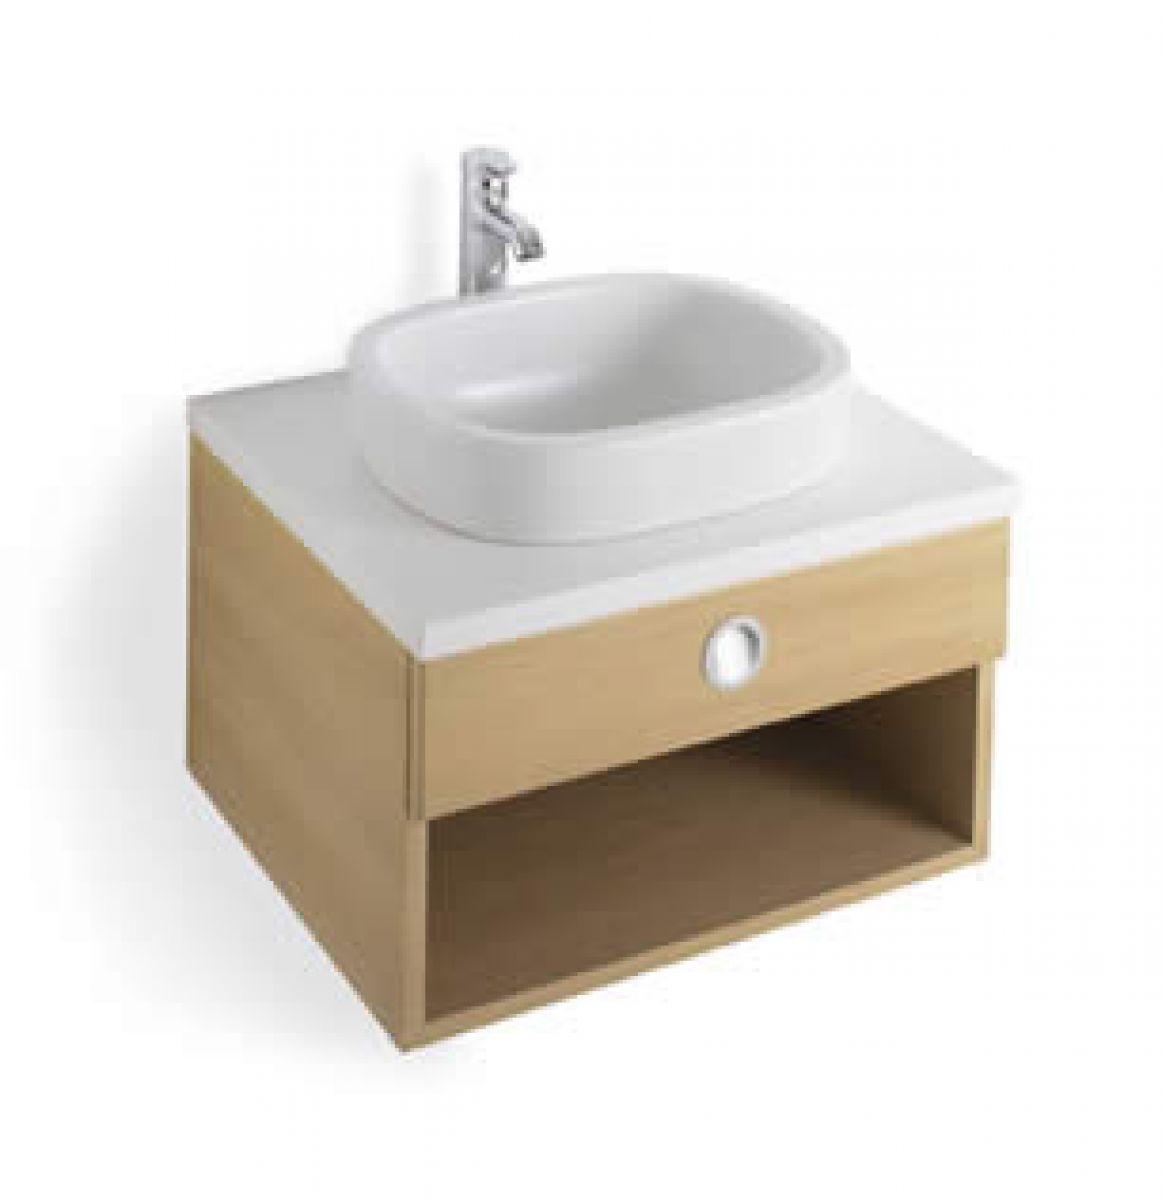 jasper morrison 650mm wall hung vessel basin unit uk bathrooms